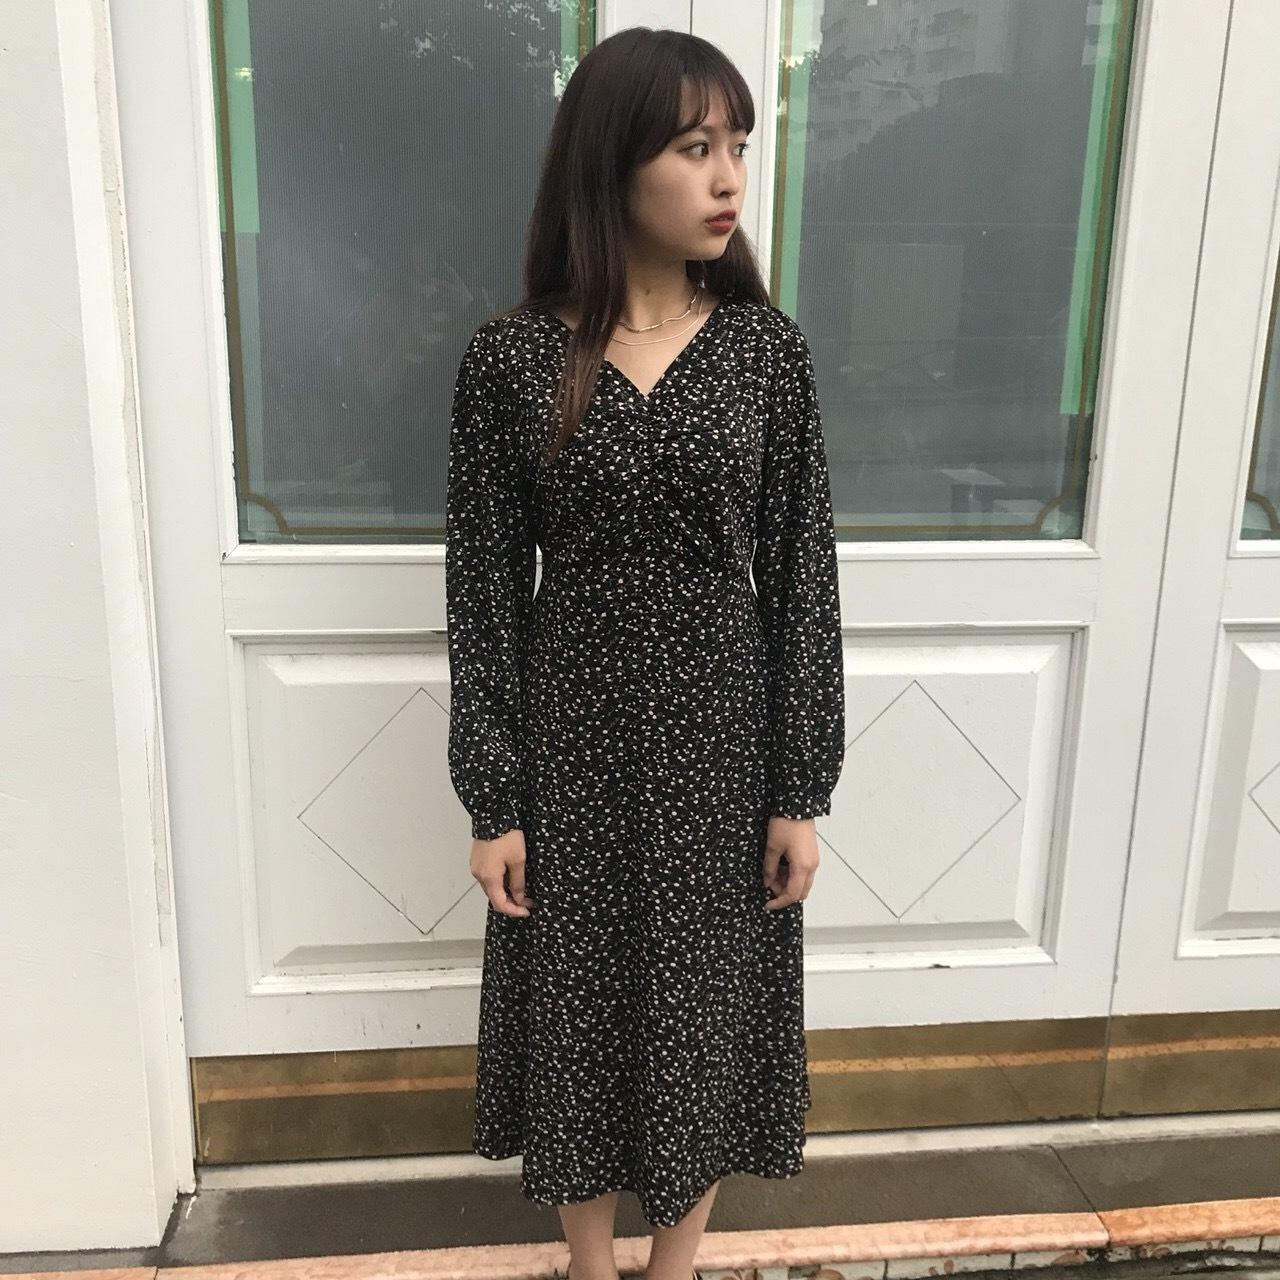 Flower bountique dress